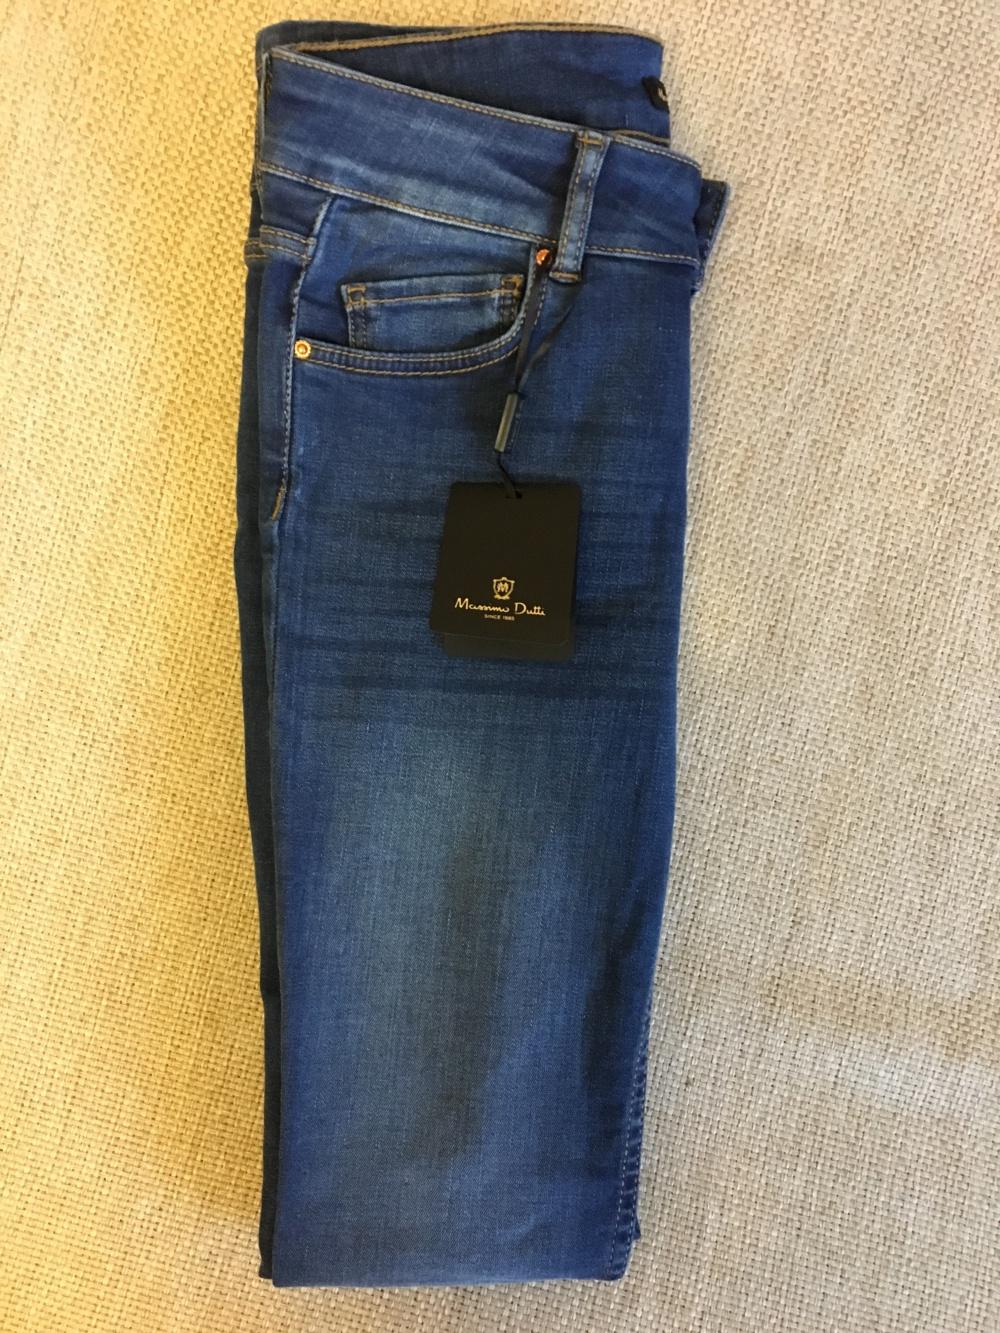 Джинсы Massimo Dutti, 34 размер, в магазине Massimo Dutti — на Шопоголик 99ee18aabe4